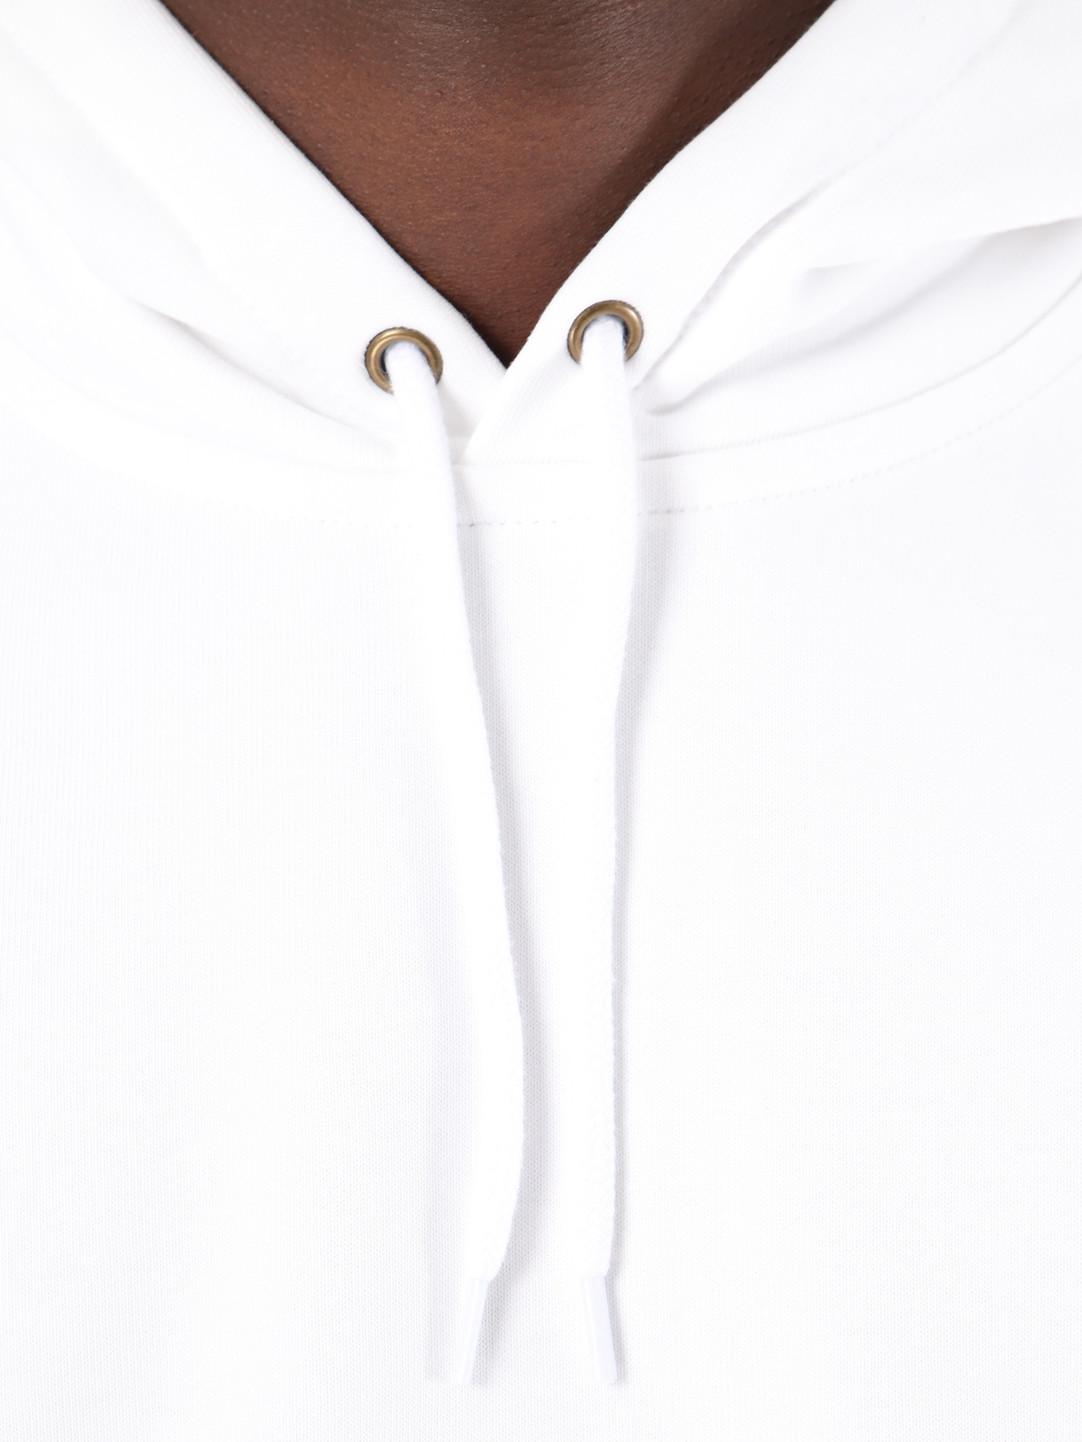 Carhartt WIP Carhartt WIP Hooded Chase Sweat White Gold 61102099